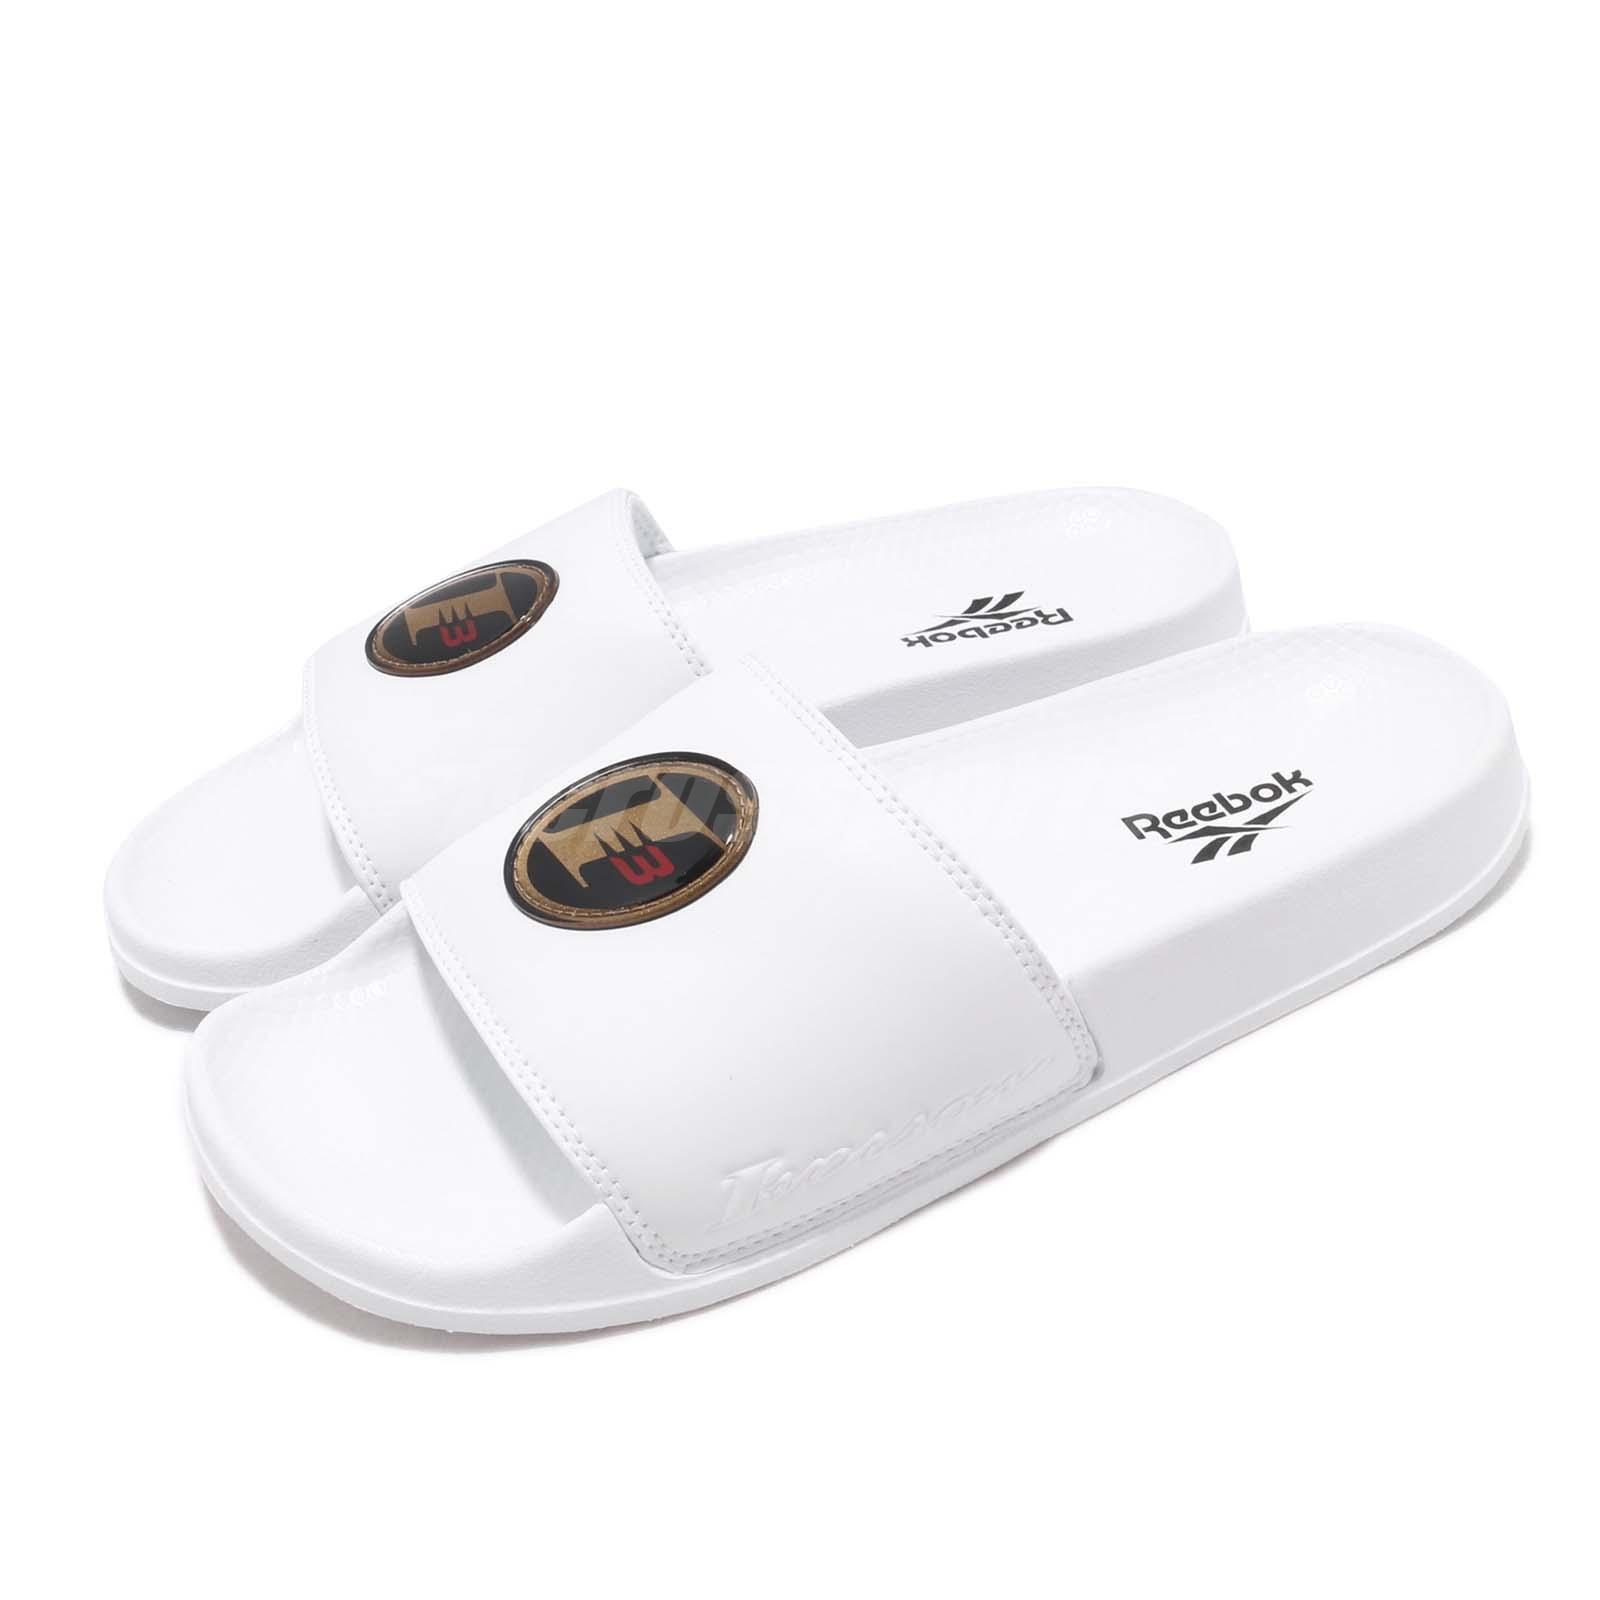 Reebok Classic Slide AI Allen Iverson I3 blanco Men Sports Sandals Slipper CN6739